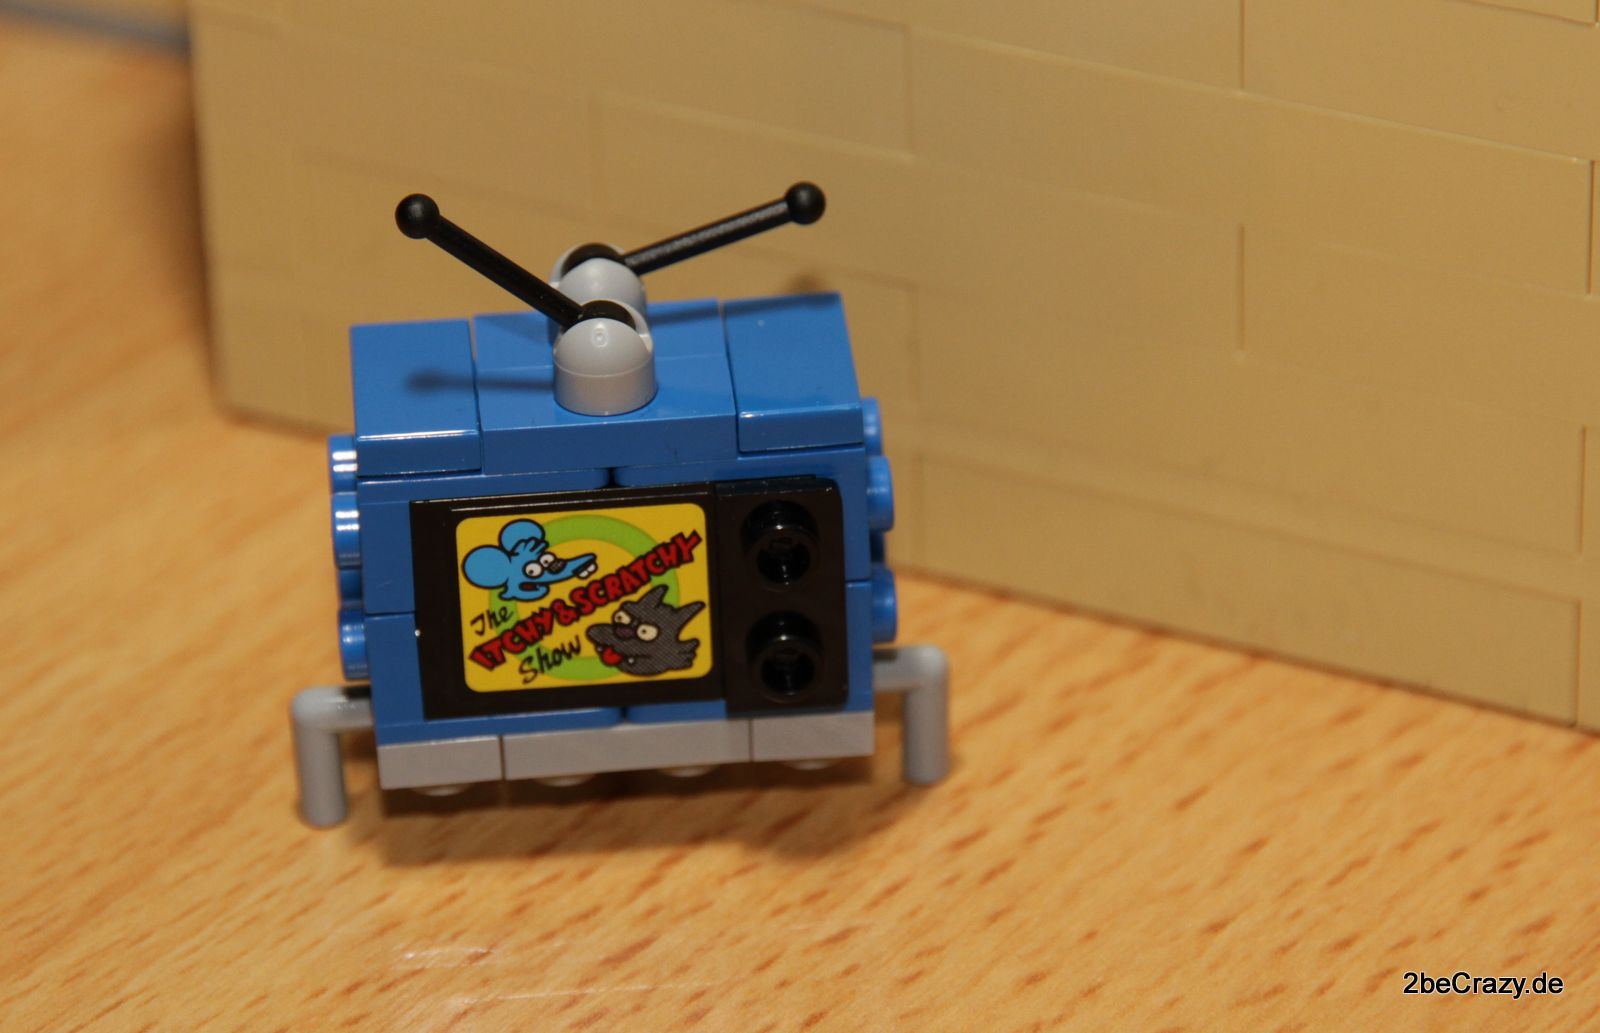 Simpsons haus lego 69 2becrazy - Haus 69 ...